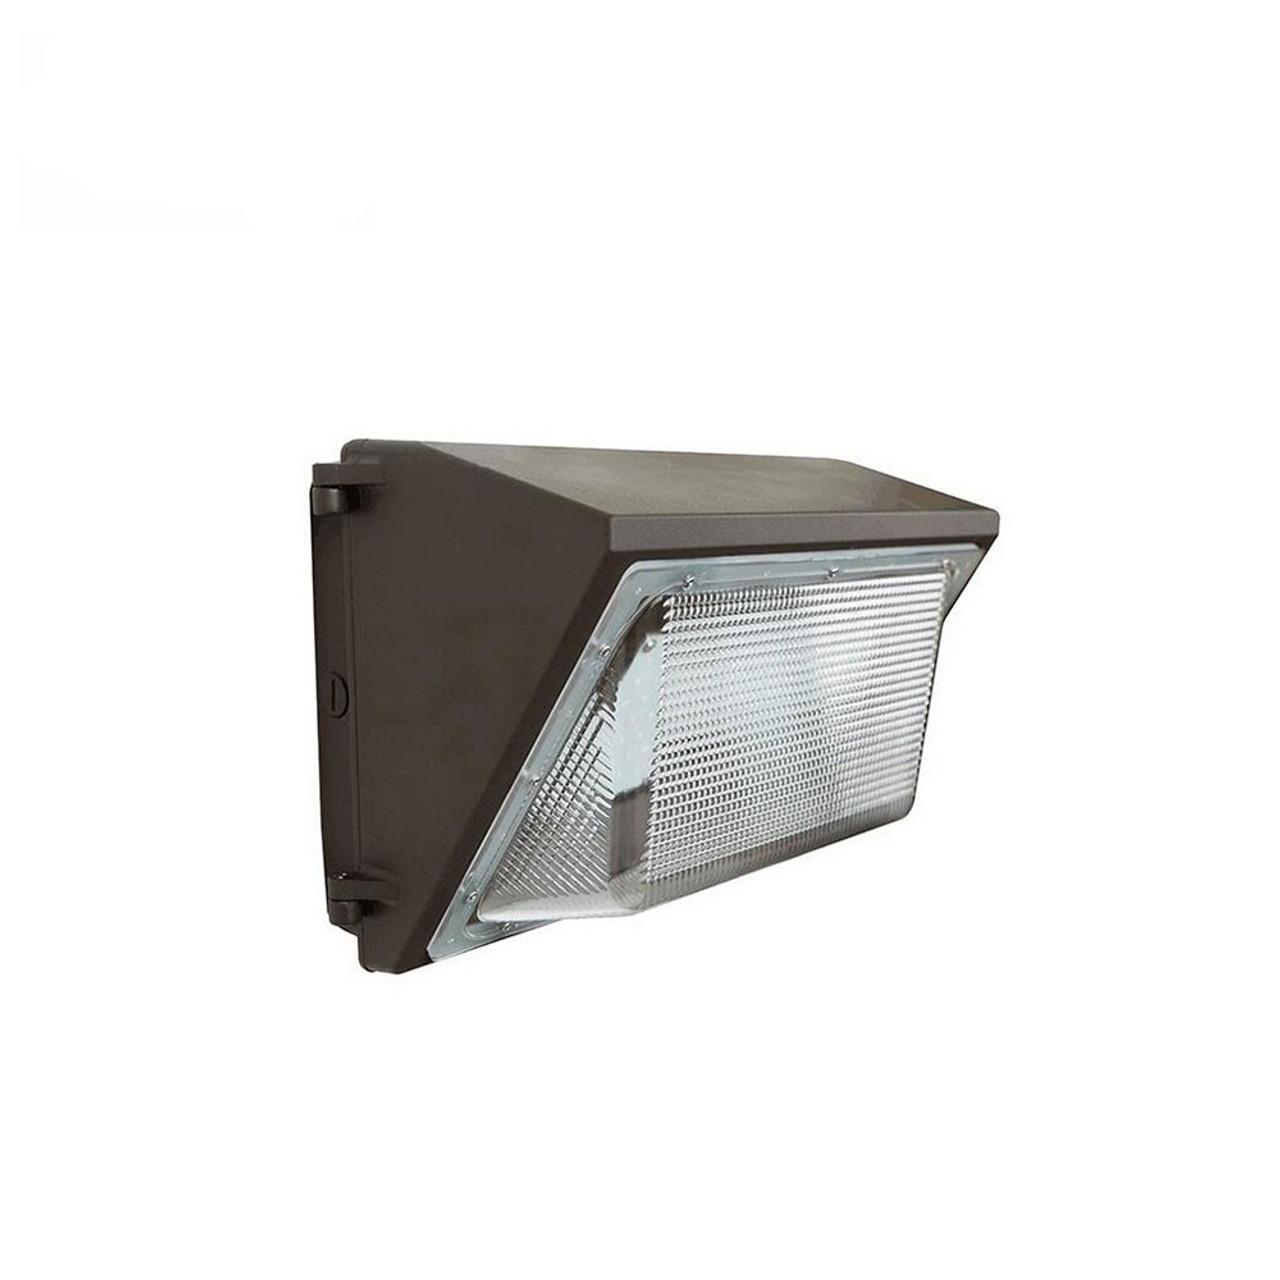 LED Wall Pack, 100 Watt, 12000 lumen, 5000 Kelvin, 480 volt, UL and DLC Listed